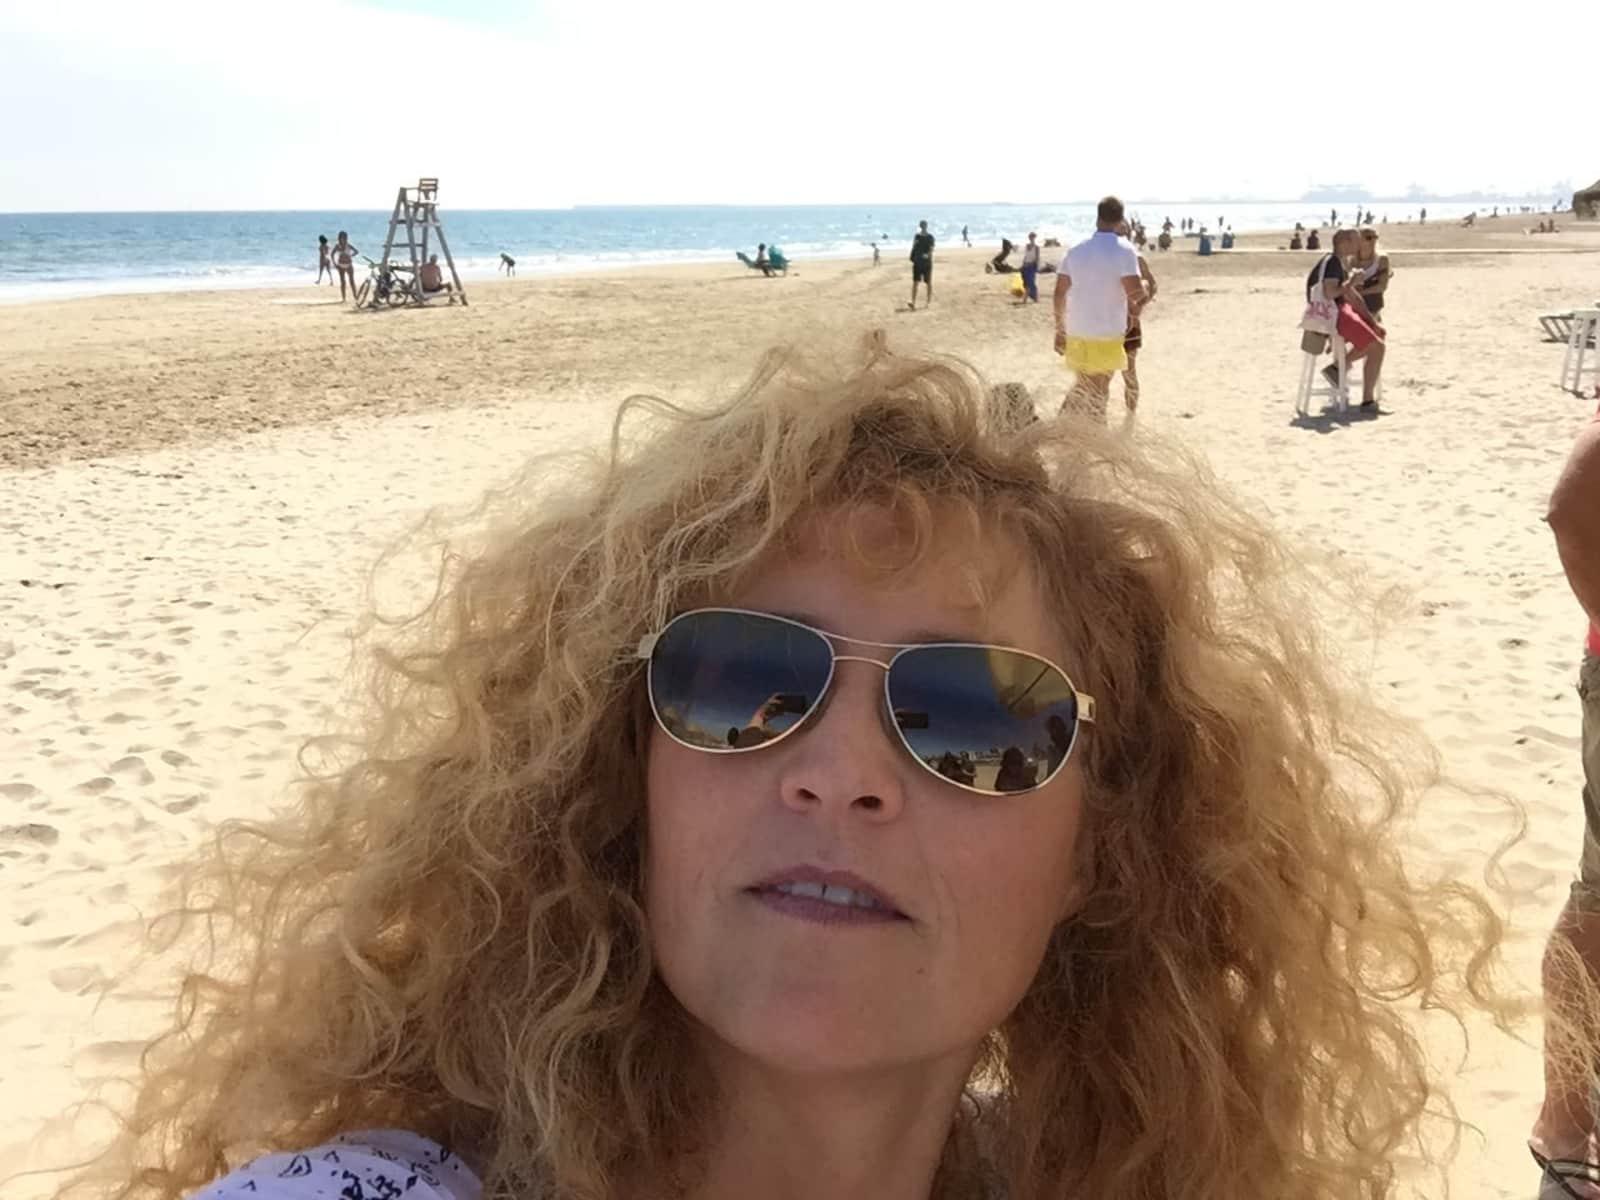 Jackie from Valencia, Spain